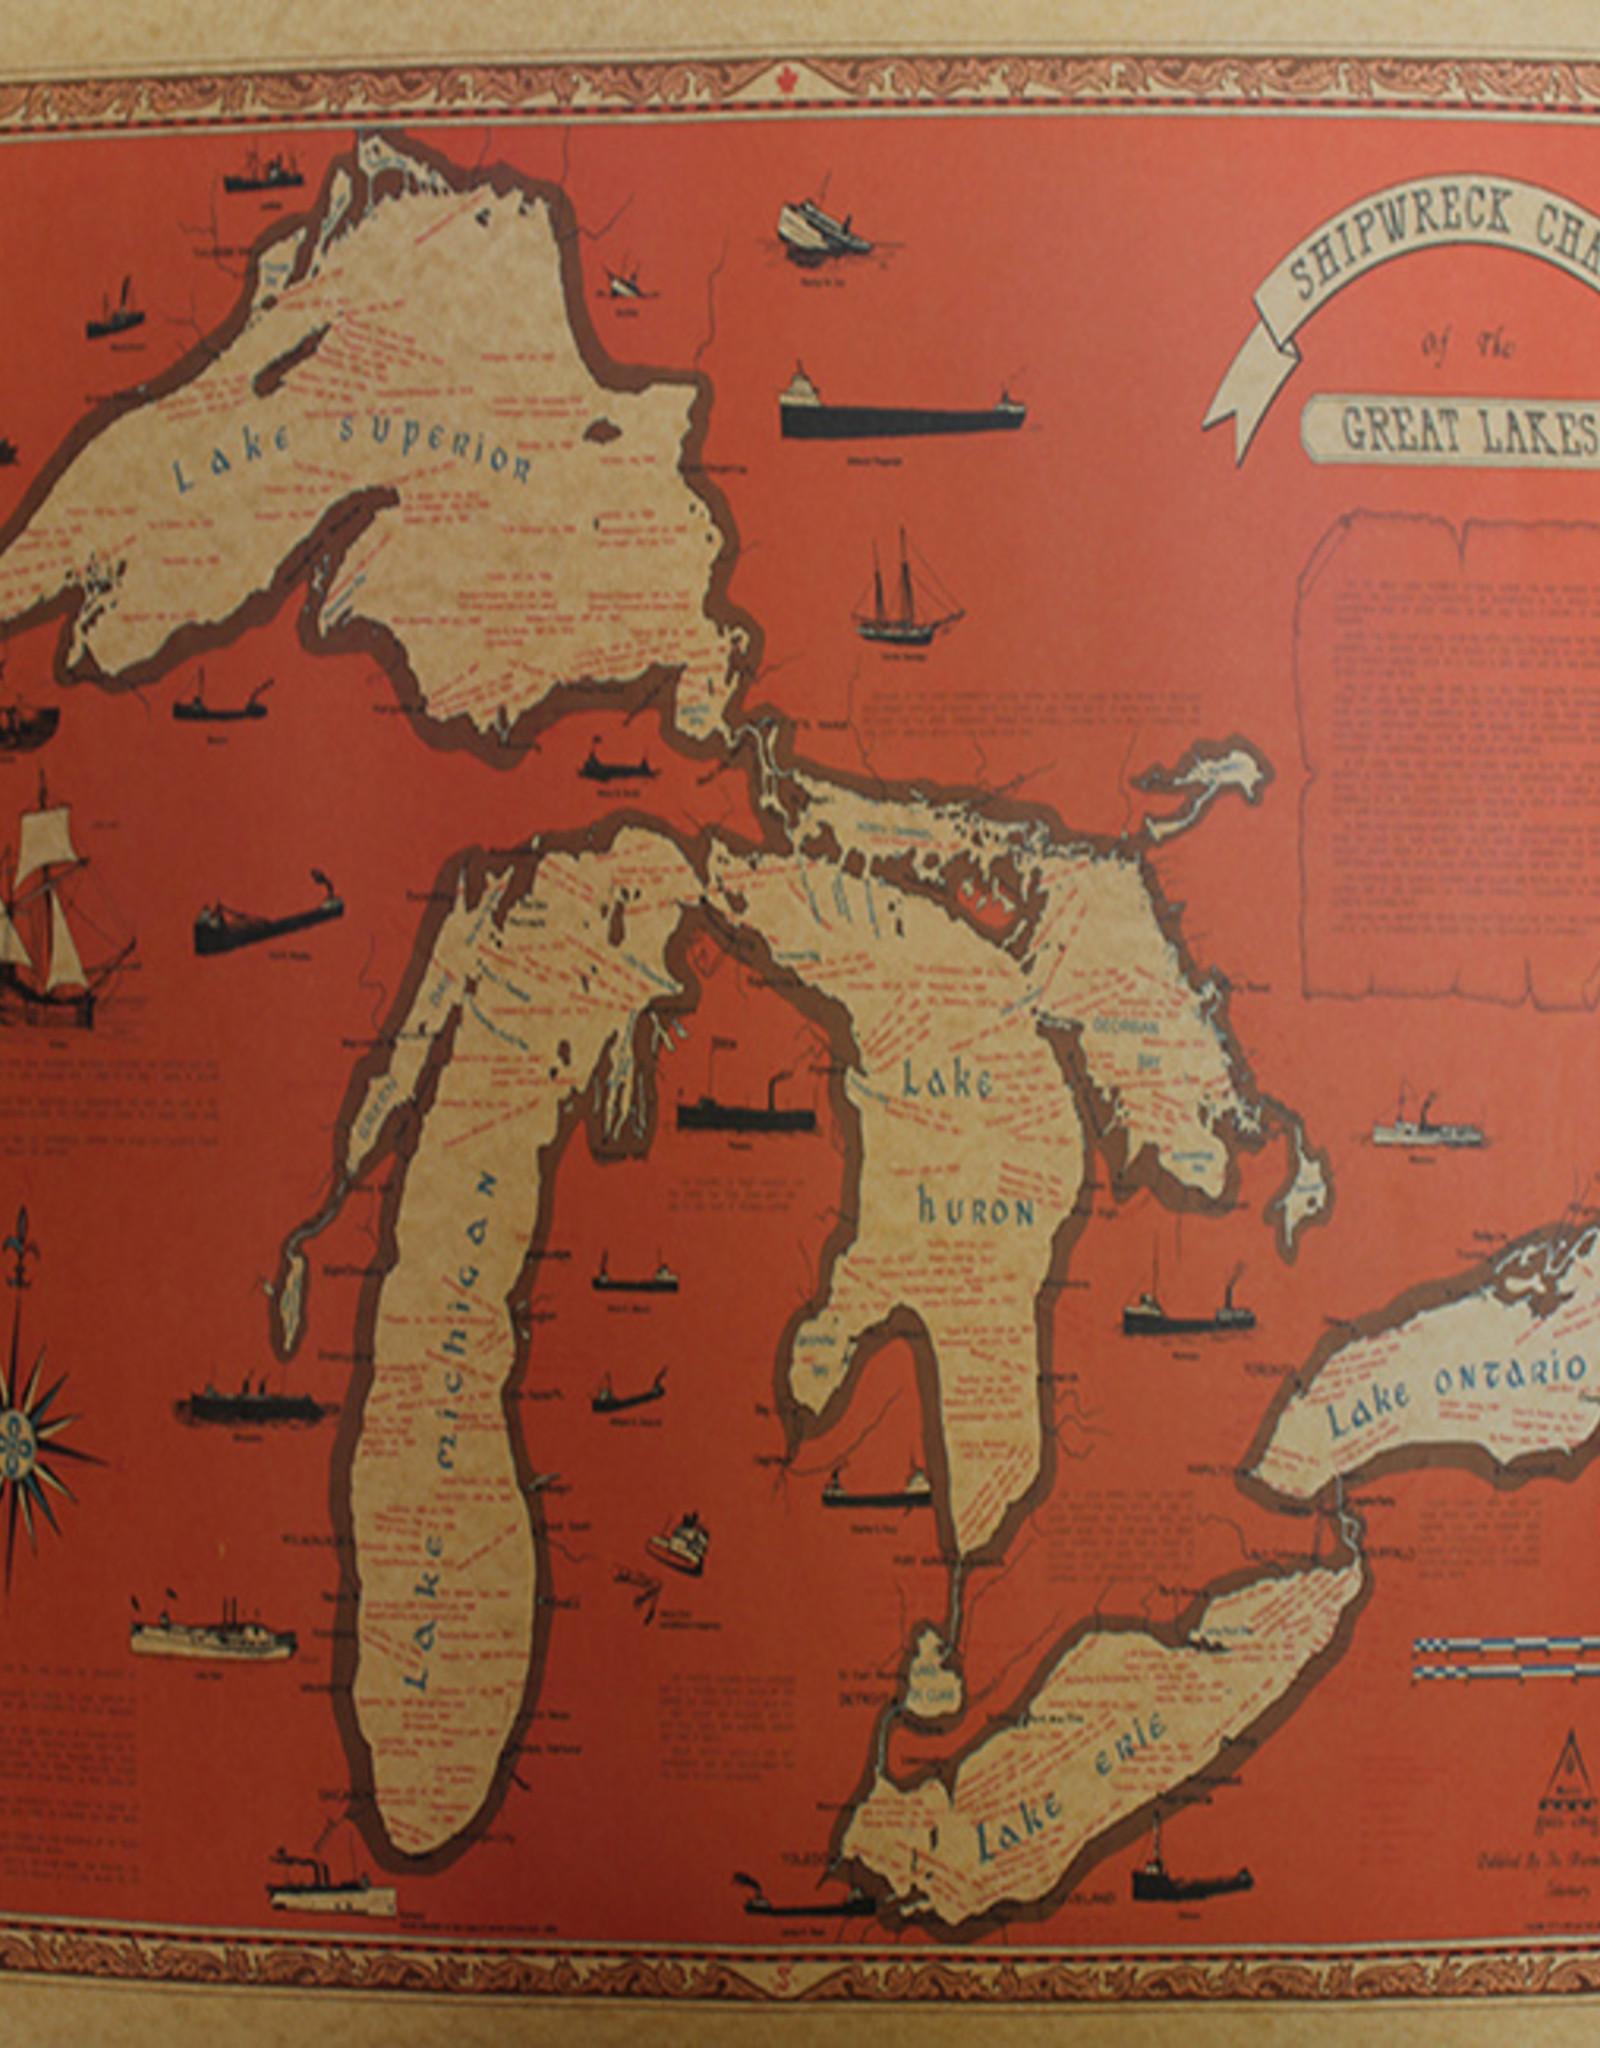 Great Lakes Shipwreck Chart